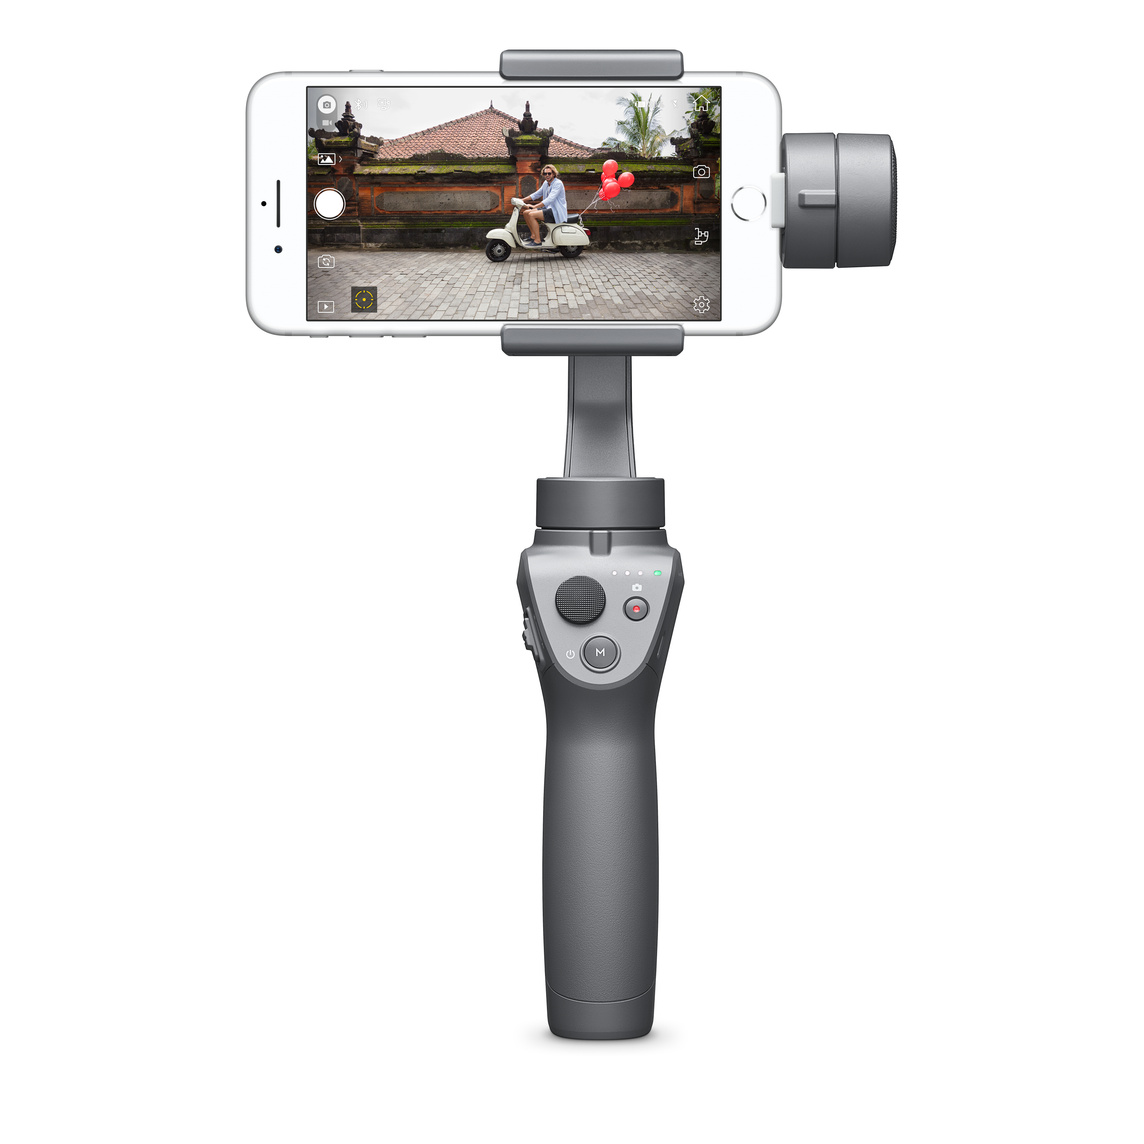 DJI OSMO Mobile 2 Gimbal for iPhone